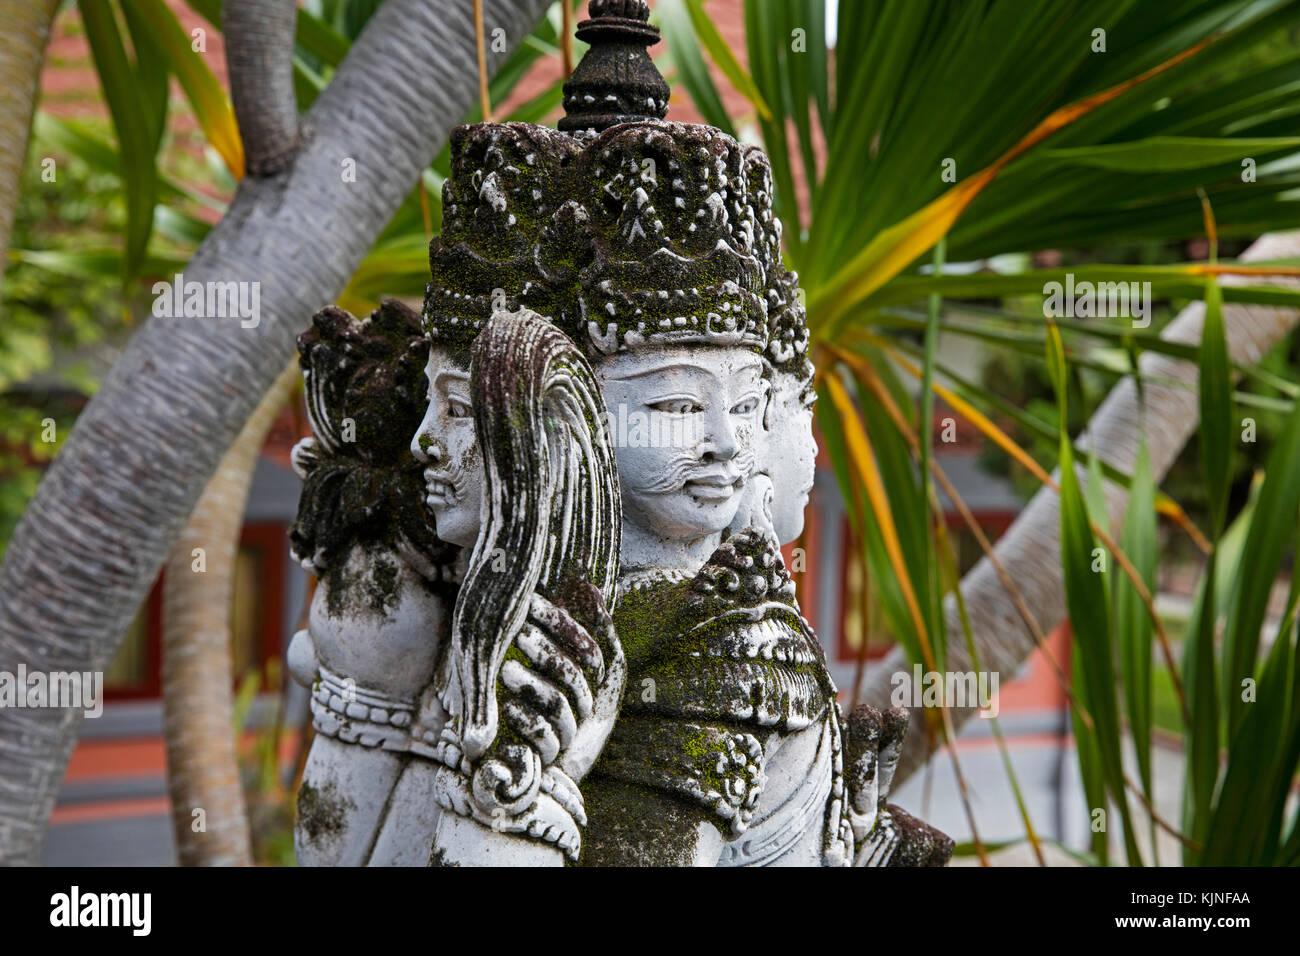 Brahmavihara-Arama / Vihara Buddha Banjar / Brahma Vihara Arama, buddhist Temple Monastery in the mountains near - Stock Image